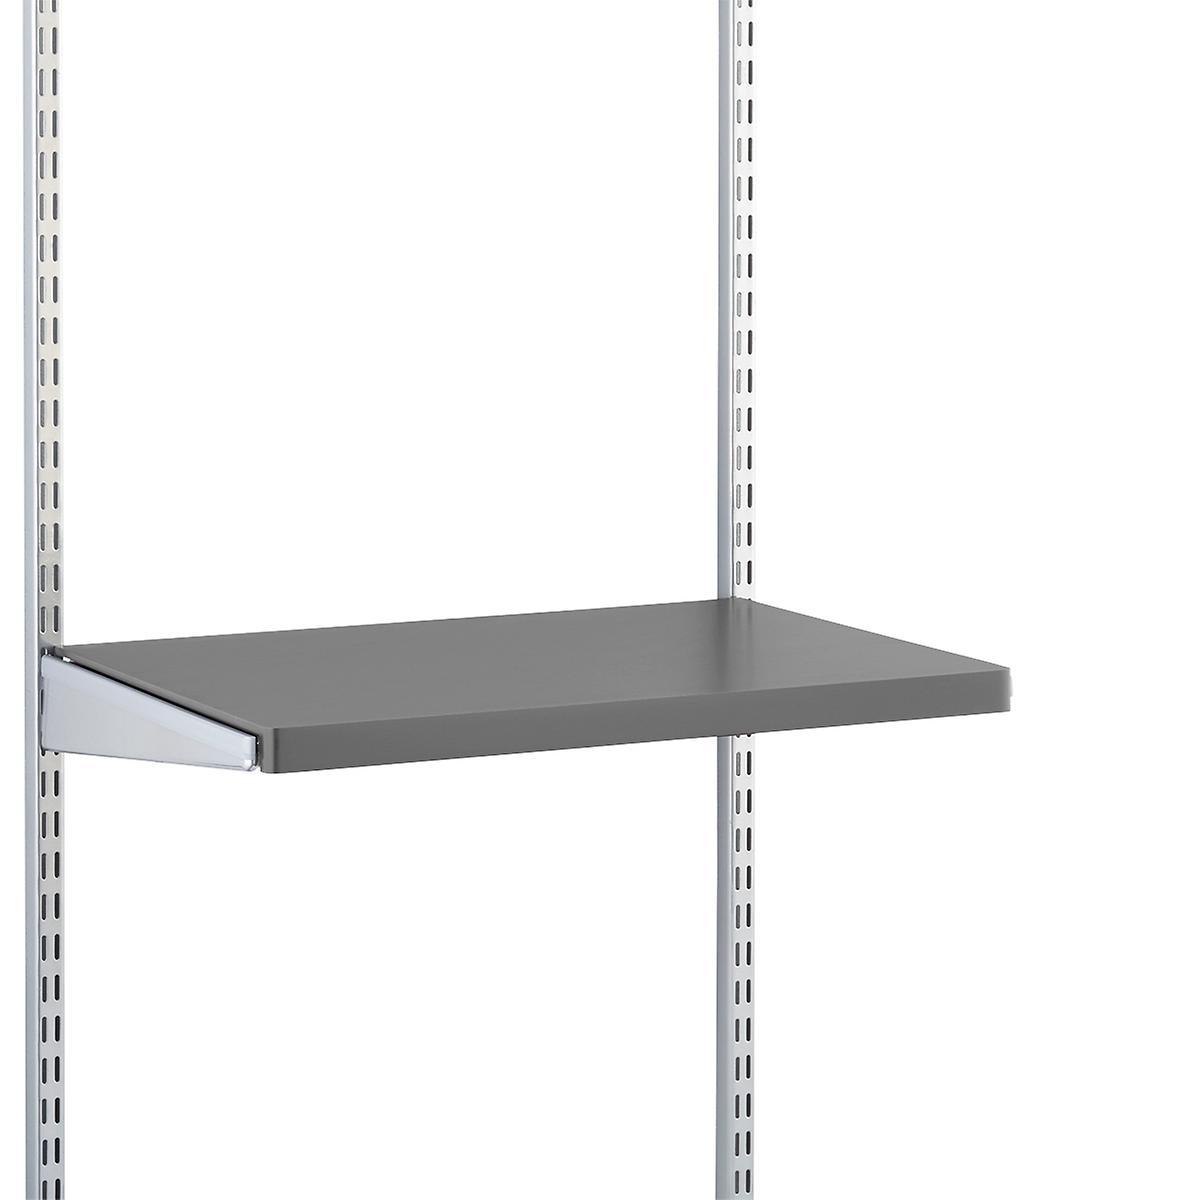 Grey Elfa Décor Gliding Shelf